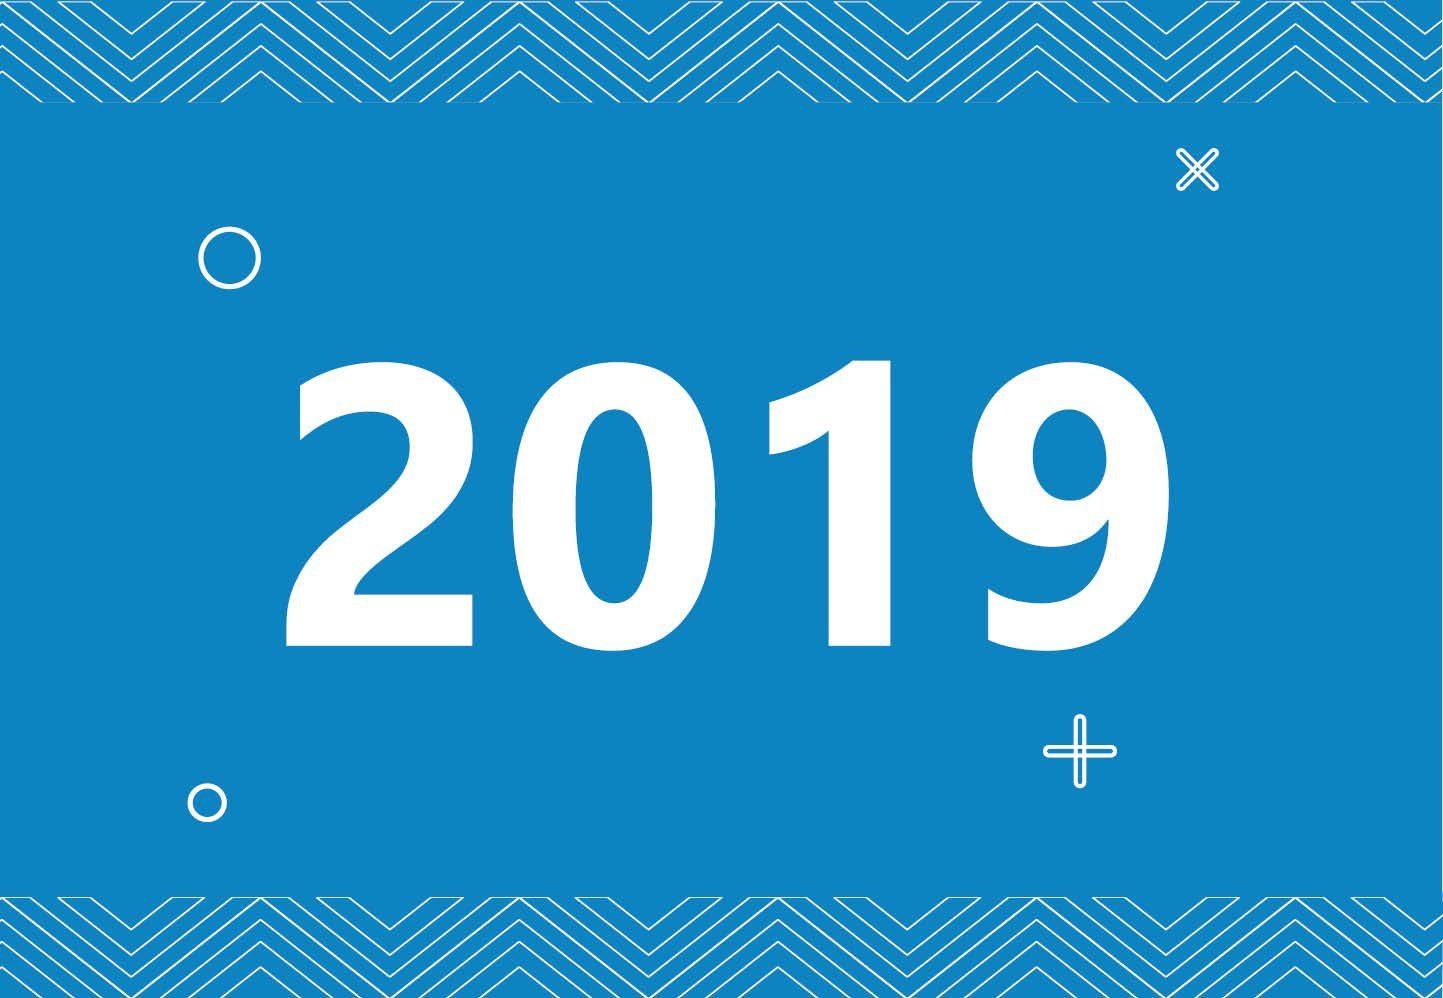 2019 Season's Greetings